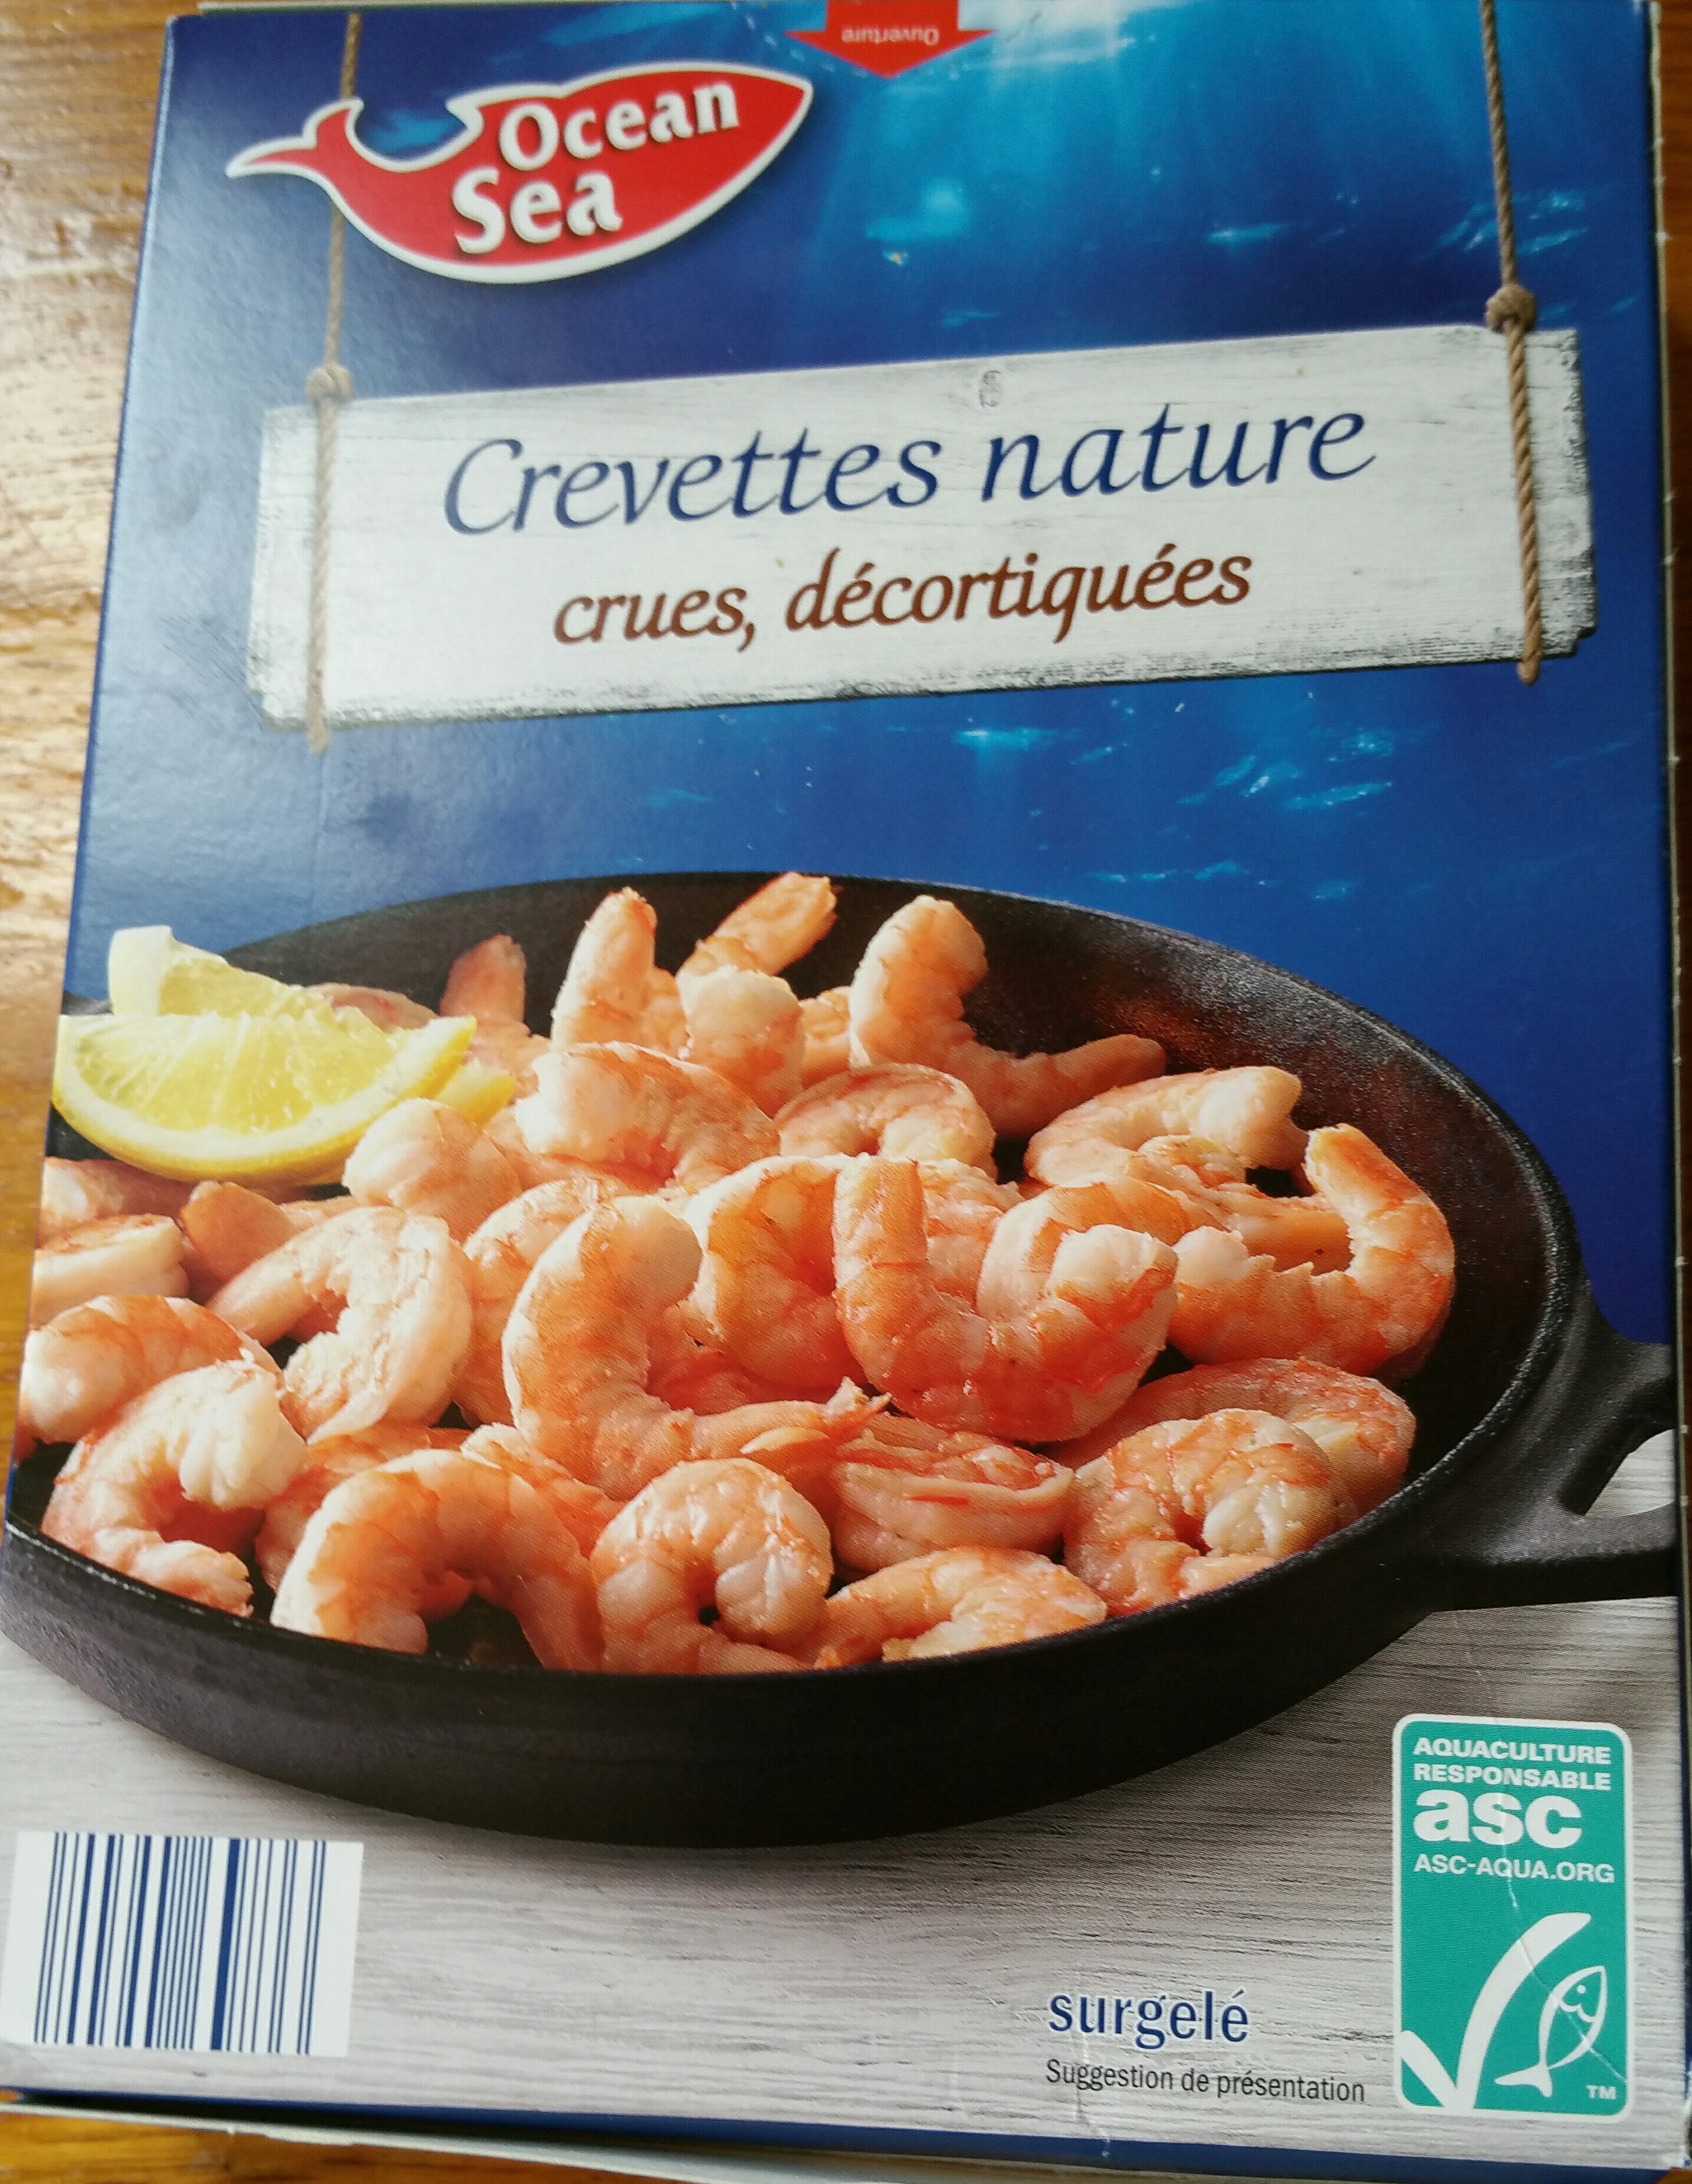 crevette nature - Product - fr